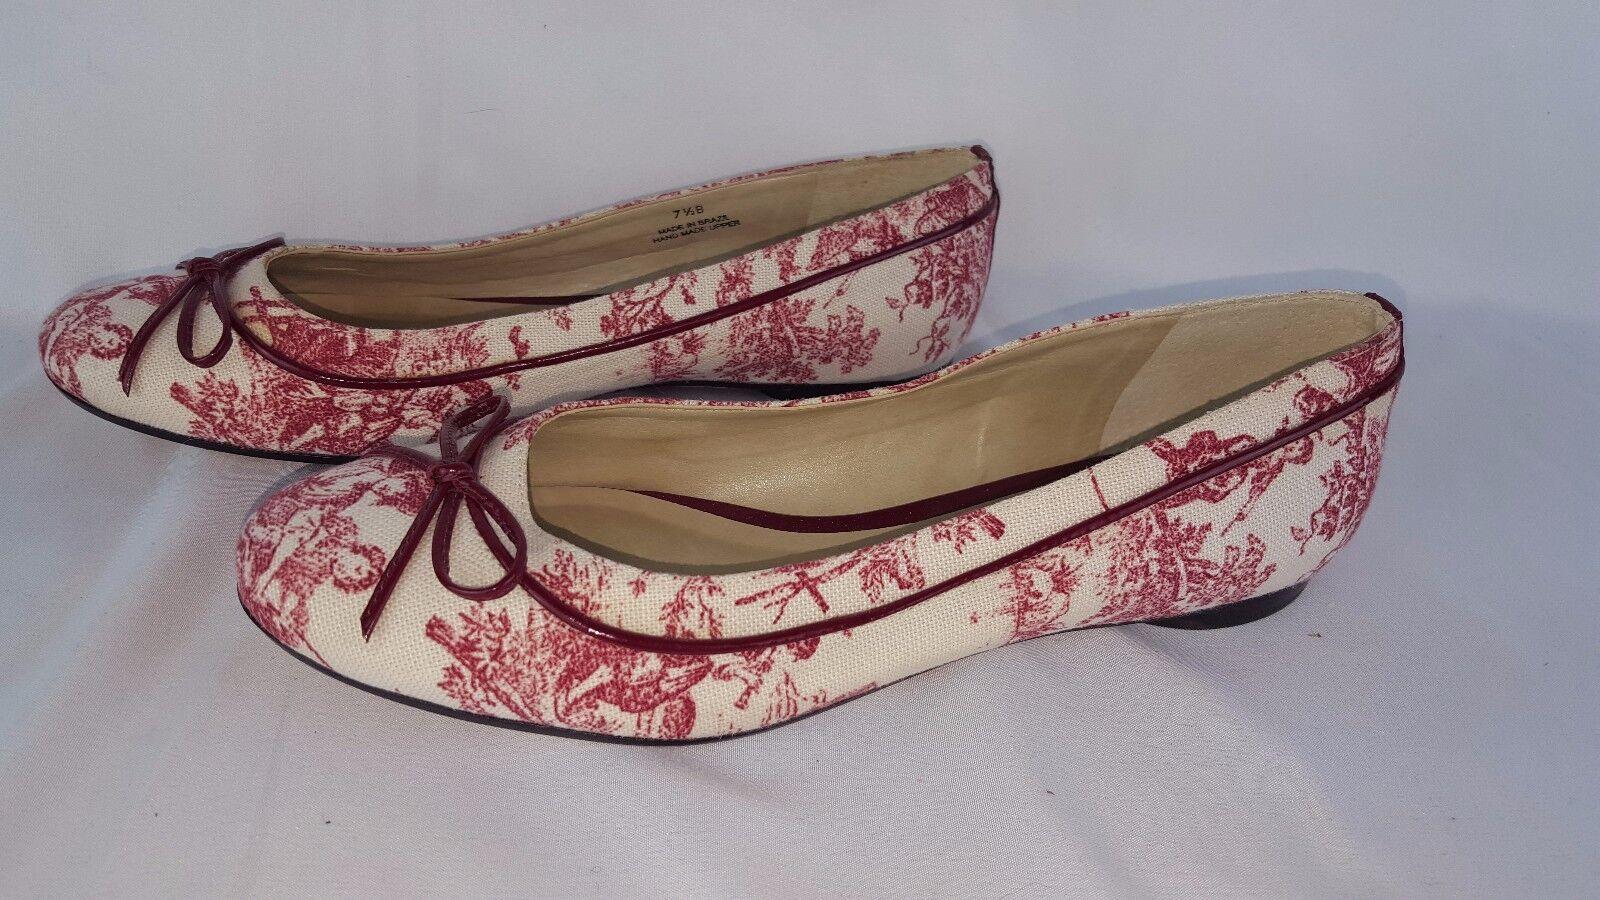 Talbots Flats Slip-on shoes Maroon & White Women Girl Pattern Sz 7.5